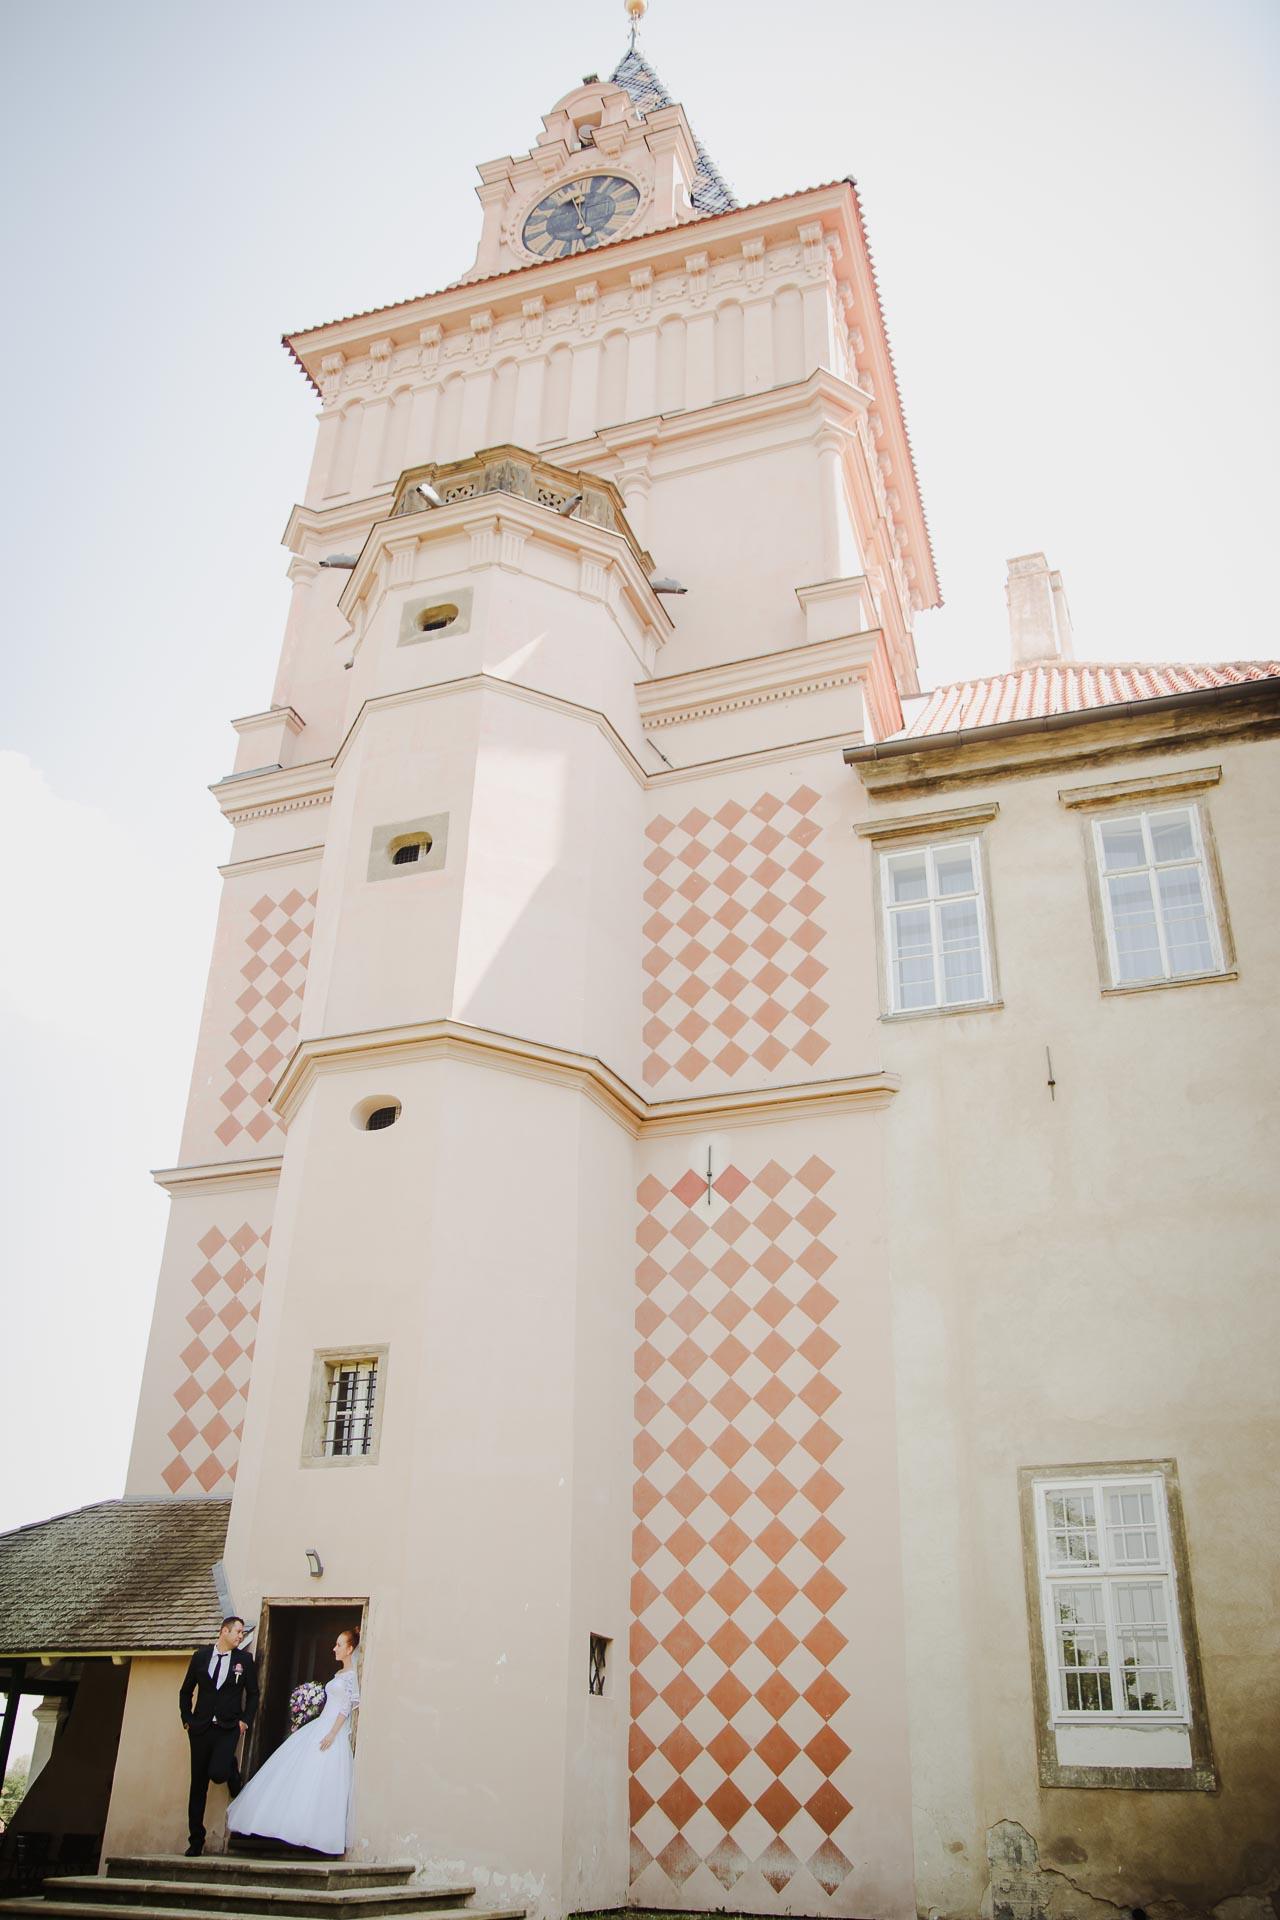 svatebni-fotografie-zamek-Brandys-nad-Labem-1440